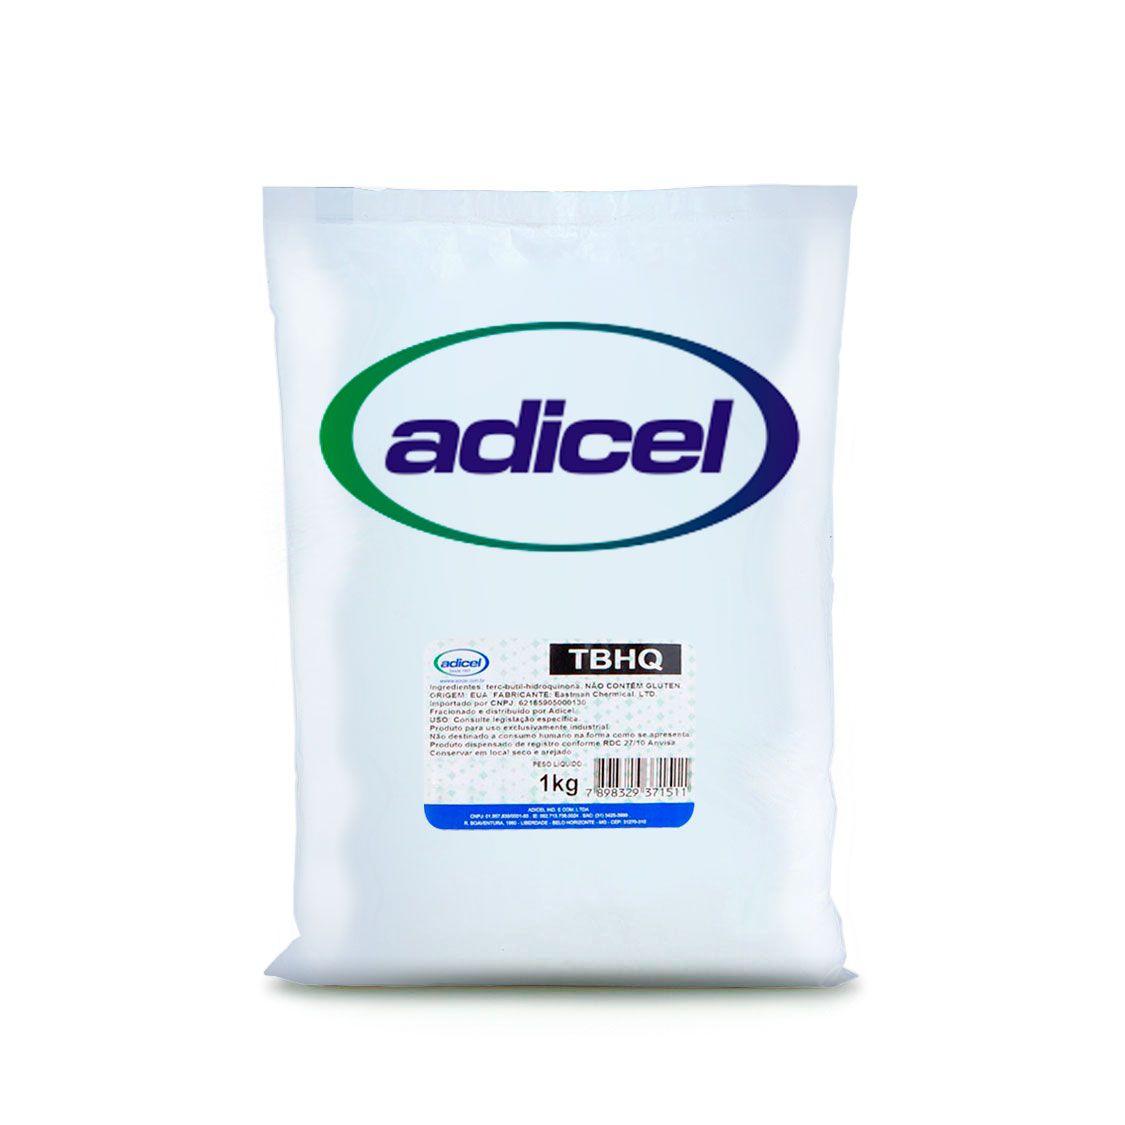 TBHQ (Terc-Butil-Hidroquinona) Antioxidante - 1 Kg